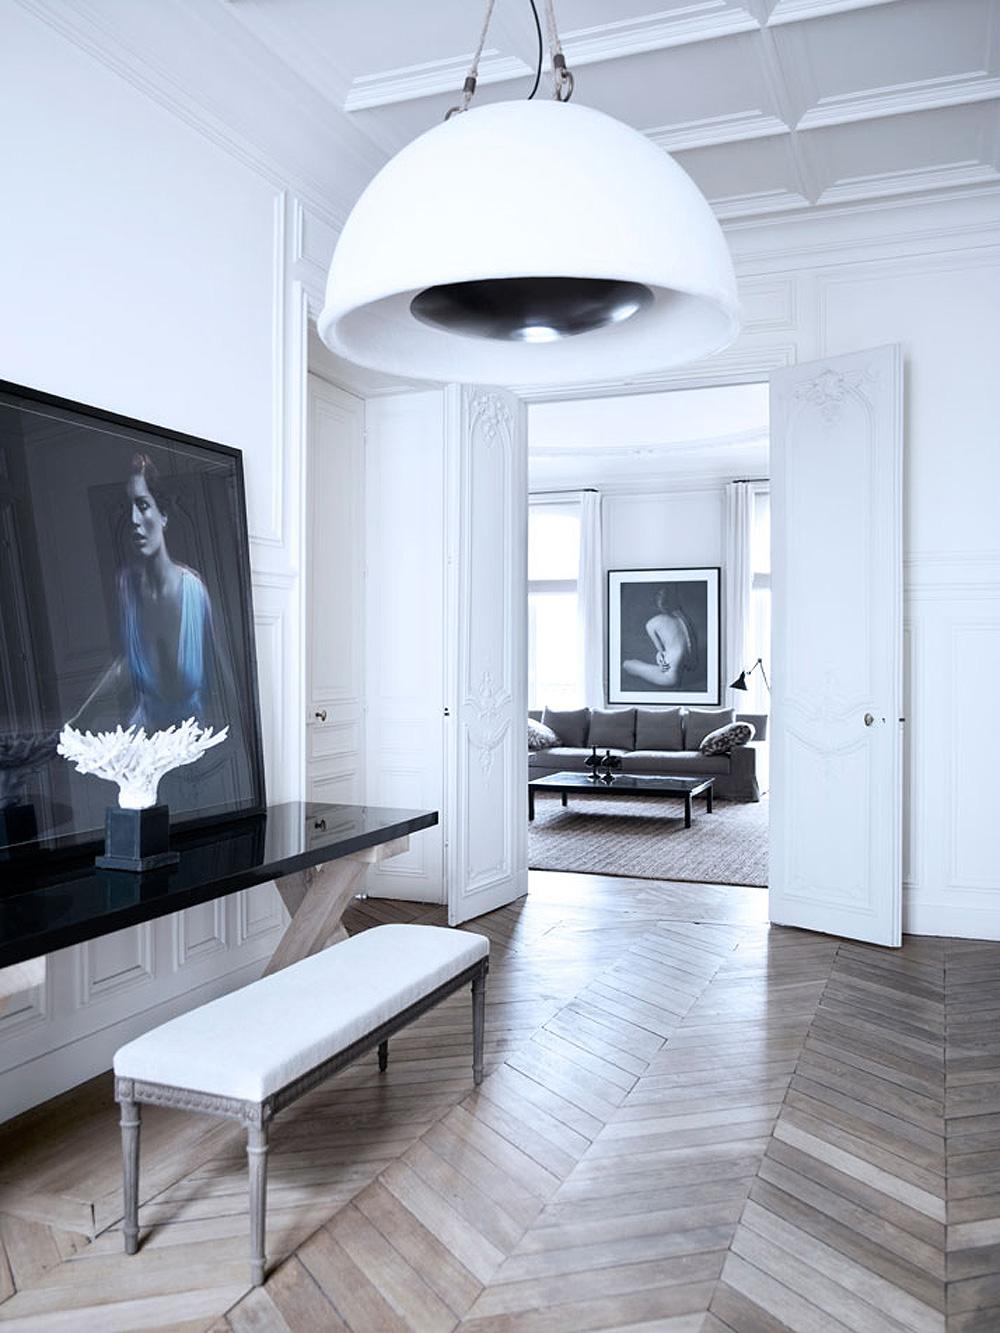 Paris-Apartment-Tour-Art-8.jpg